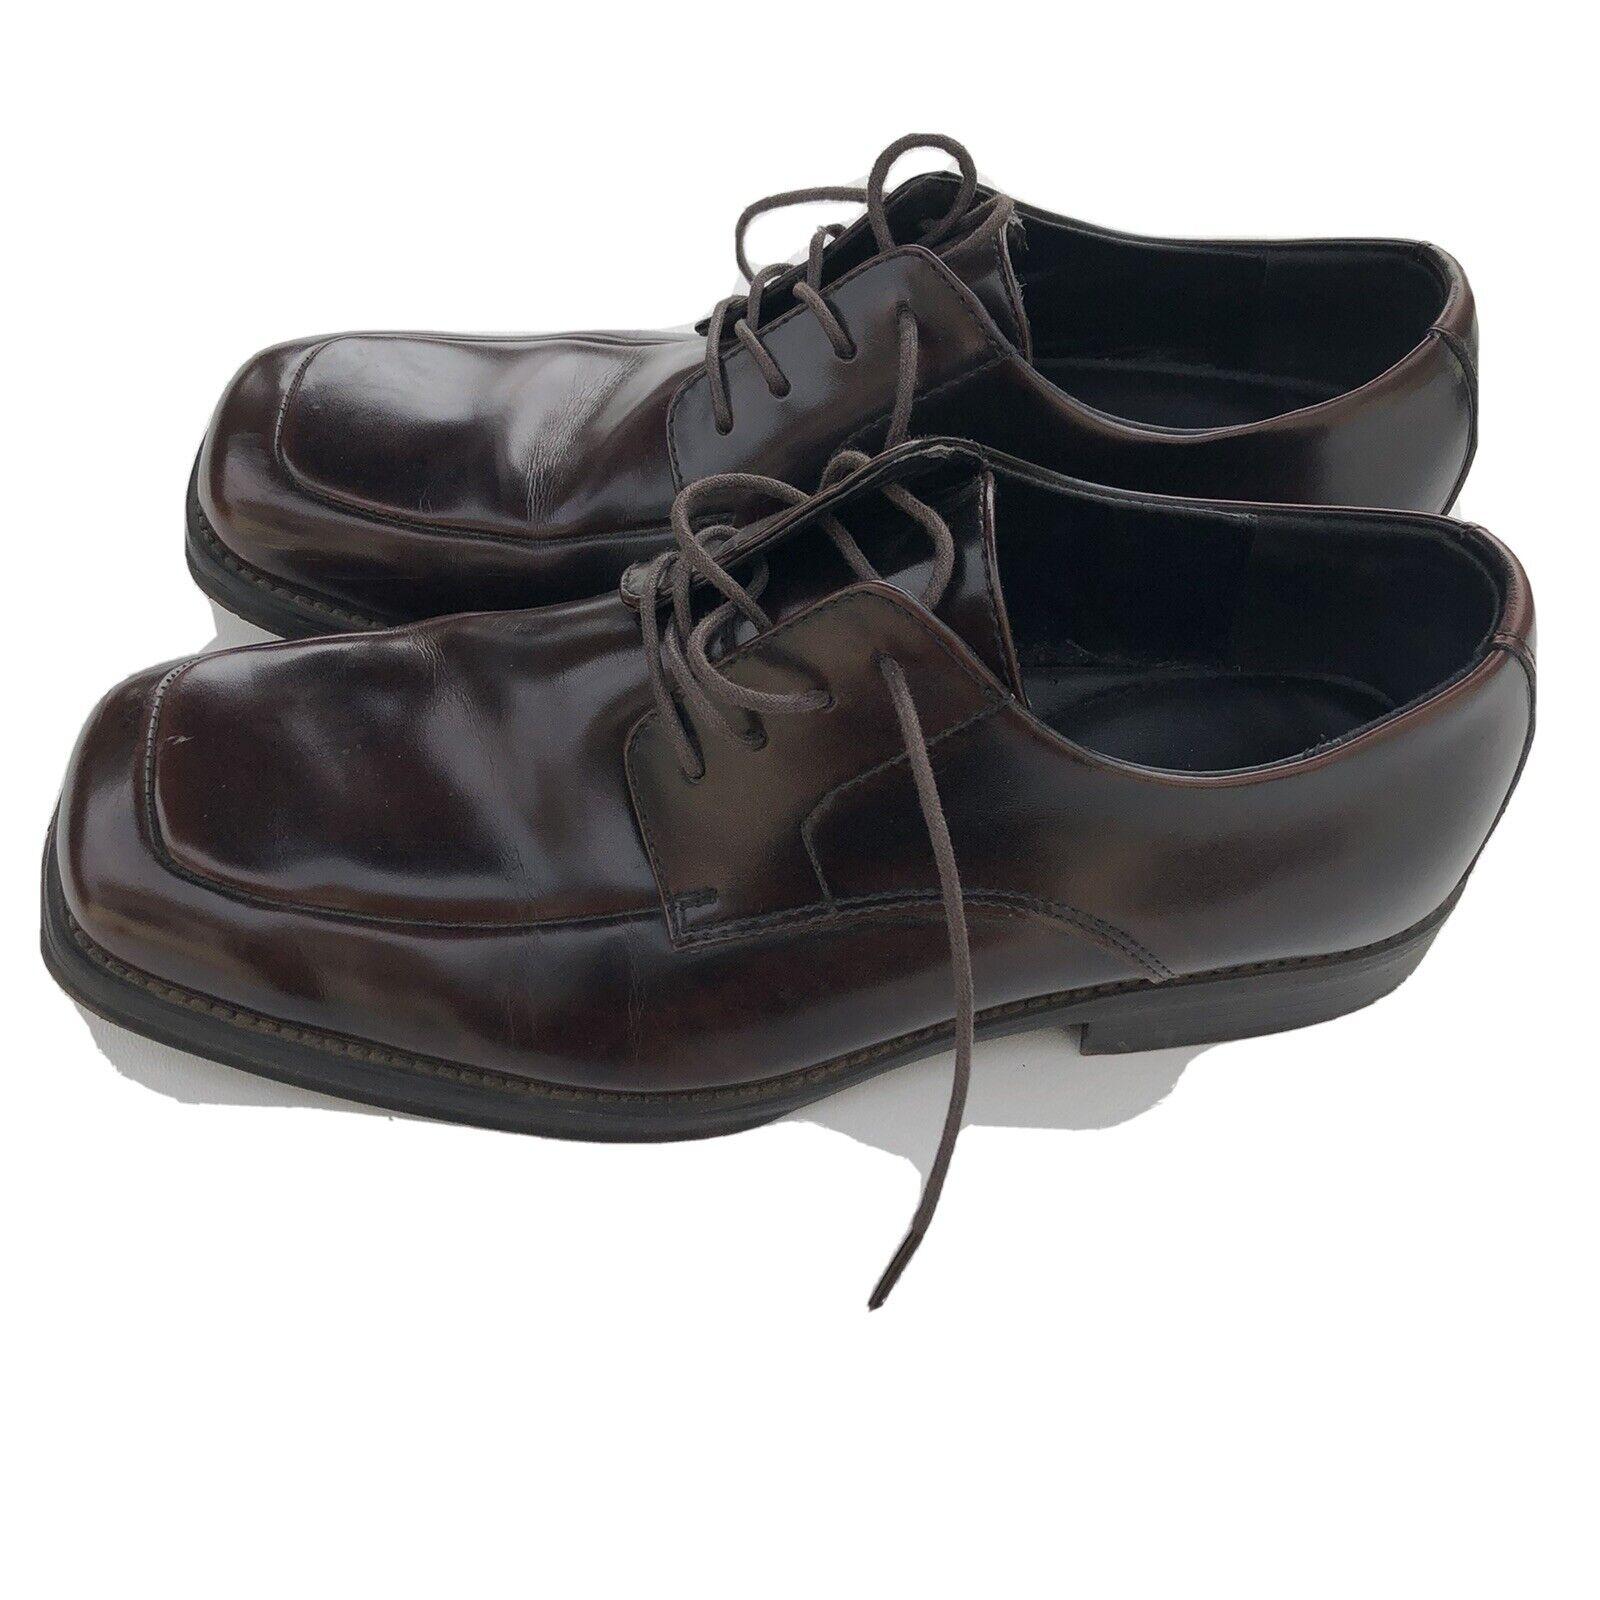 Kenneth Cole Reaction Size 11.5 Men's Brown Lace Up Dress Shoes